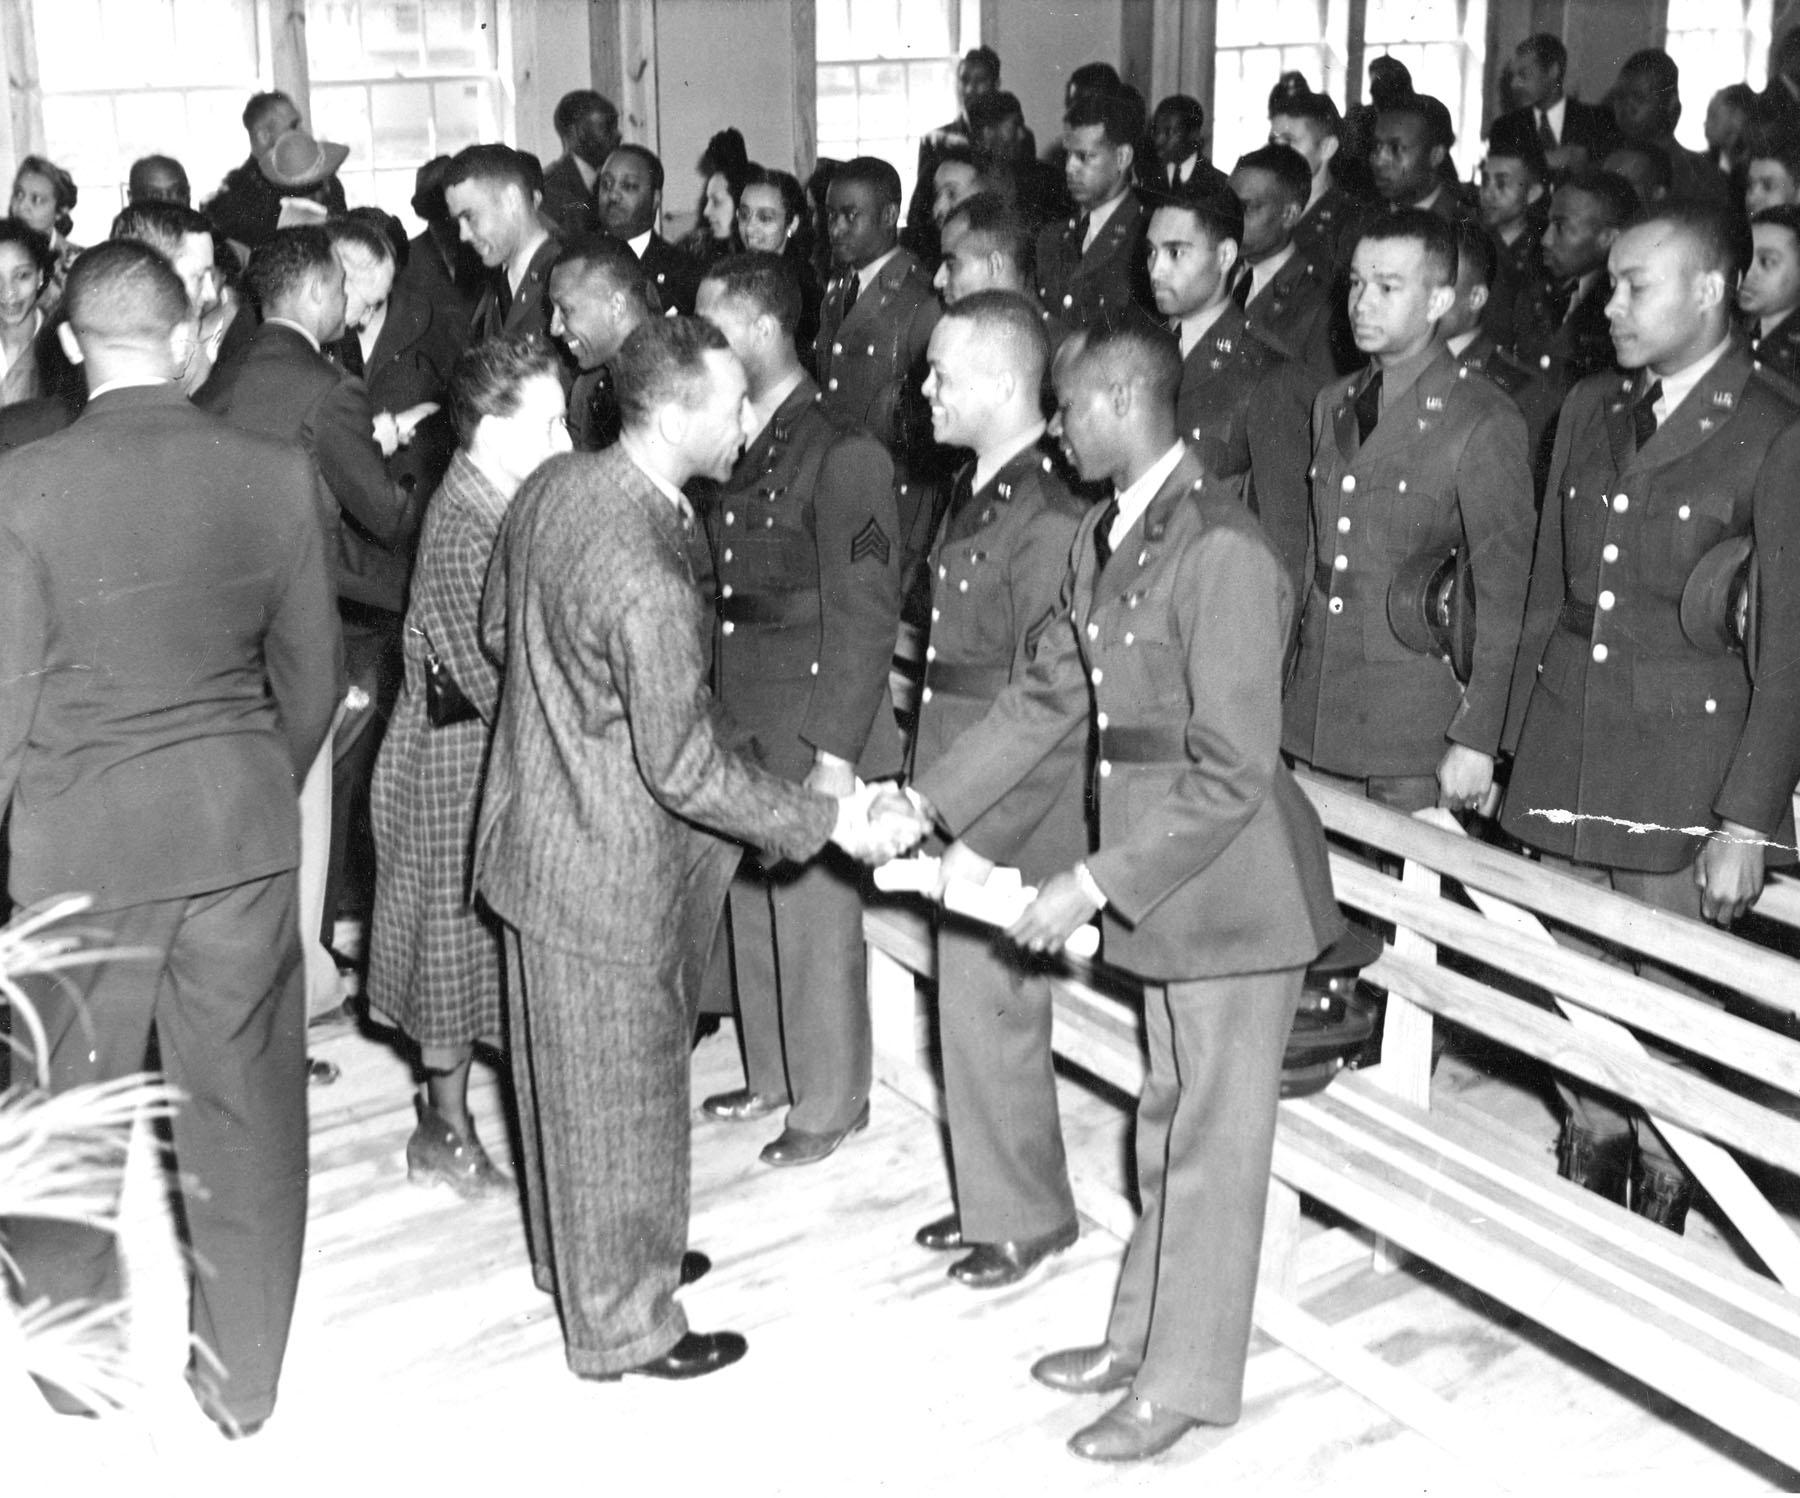 Graduation at Tuskegee